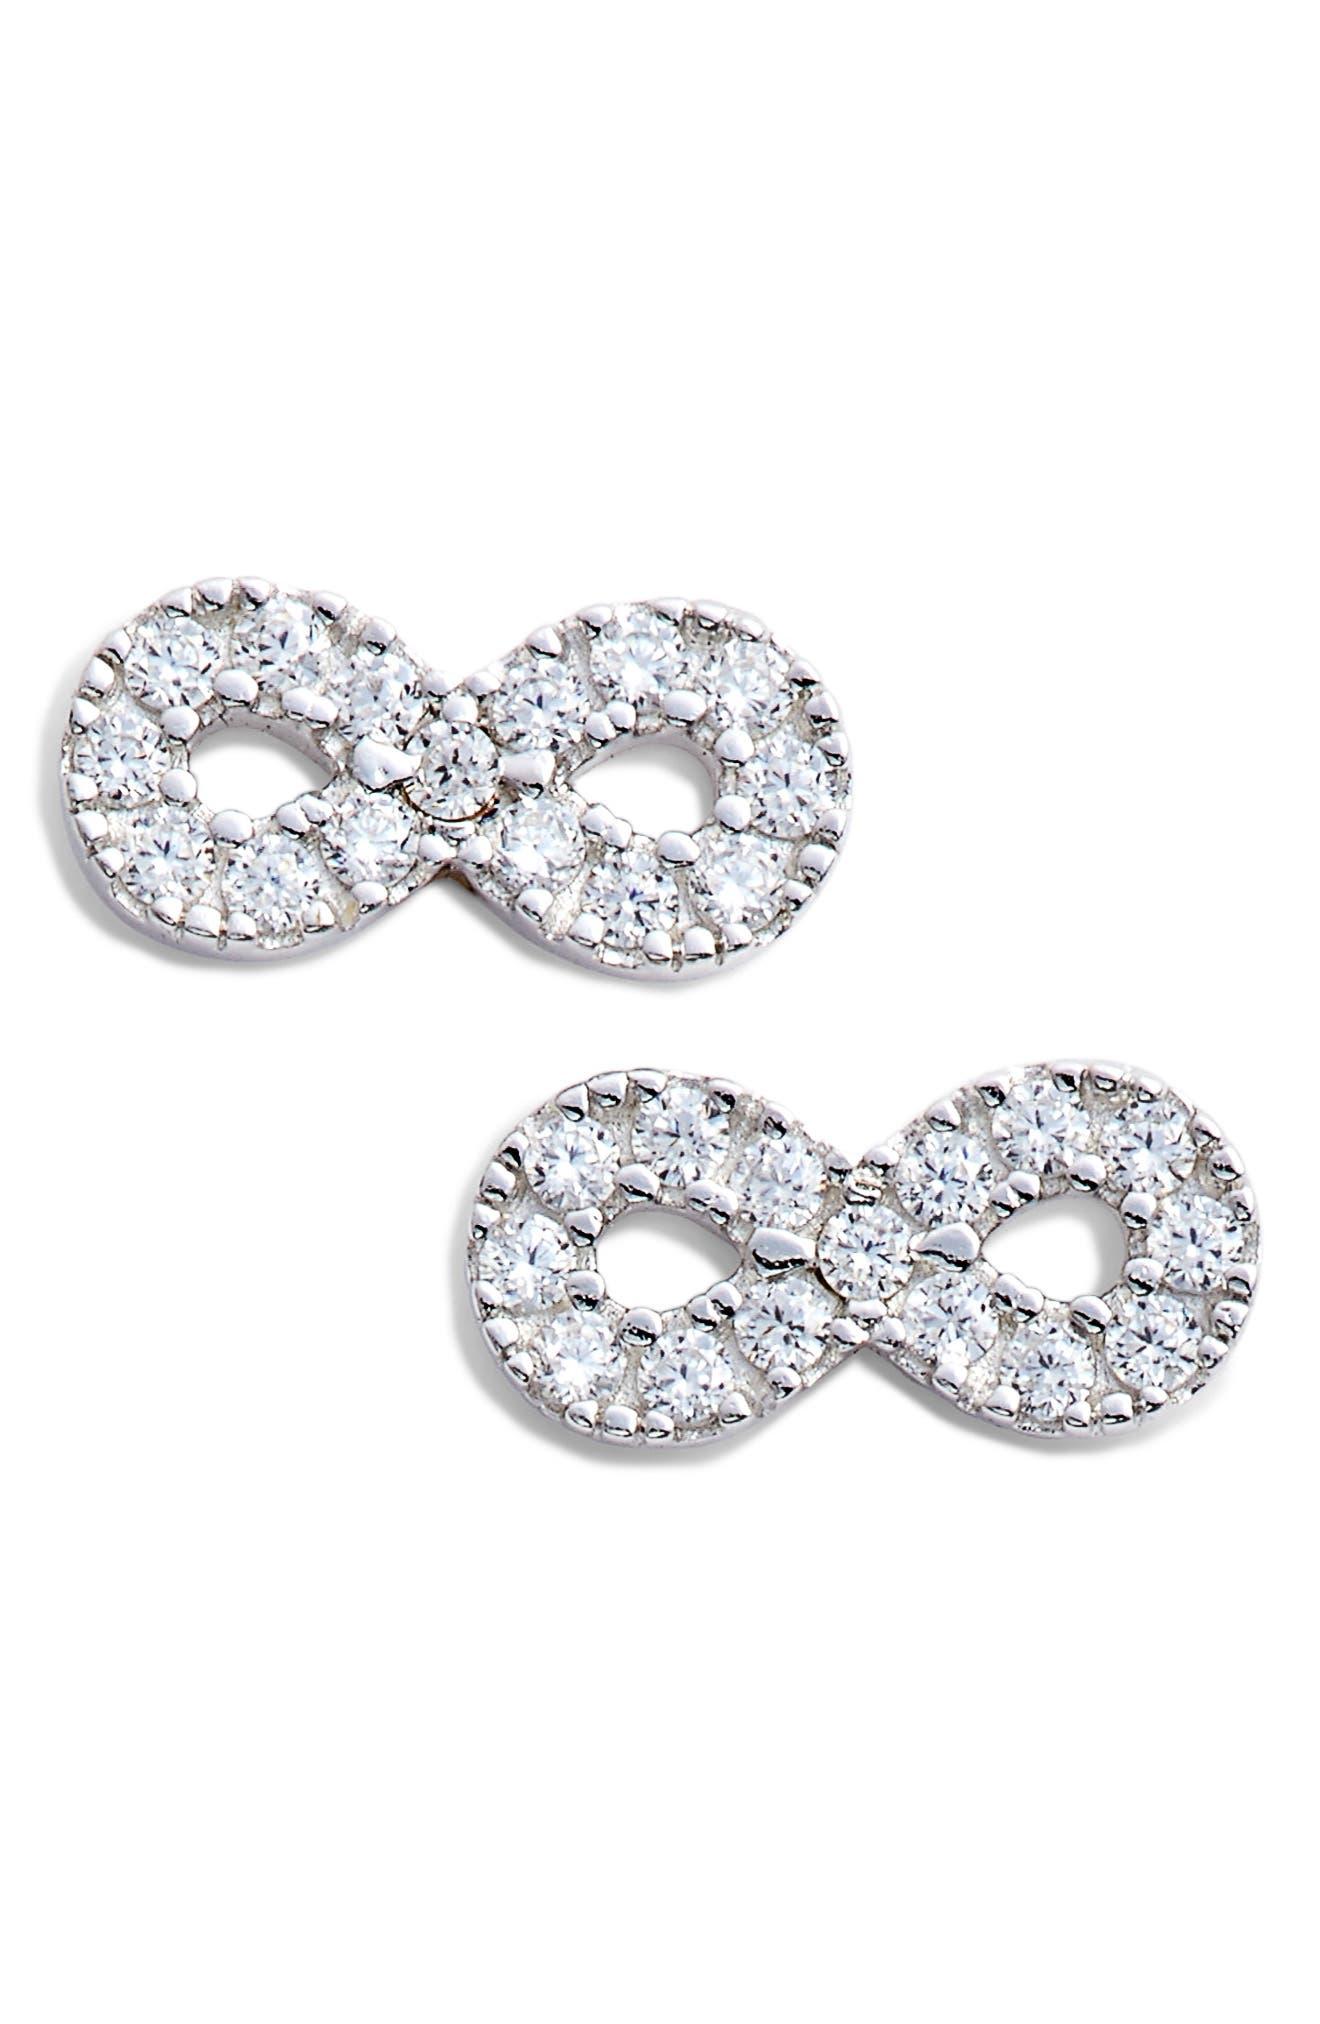 Infinity Stud Earrings,                             Main thumbnail 1, color,                             Platinum